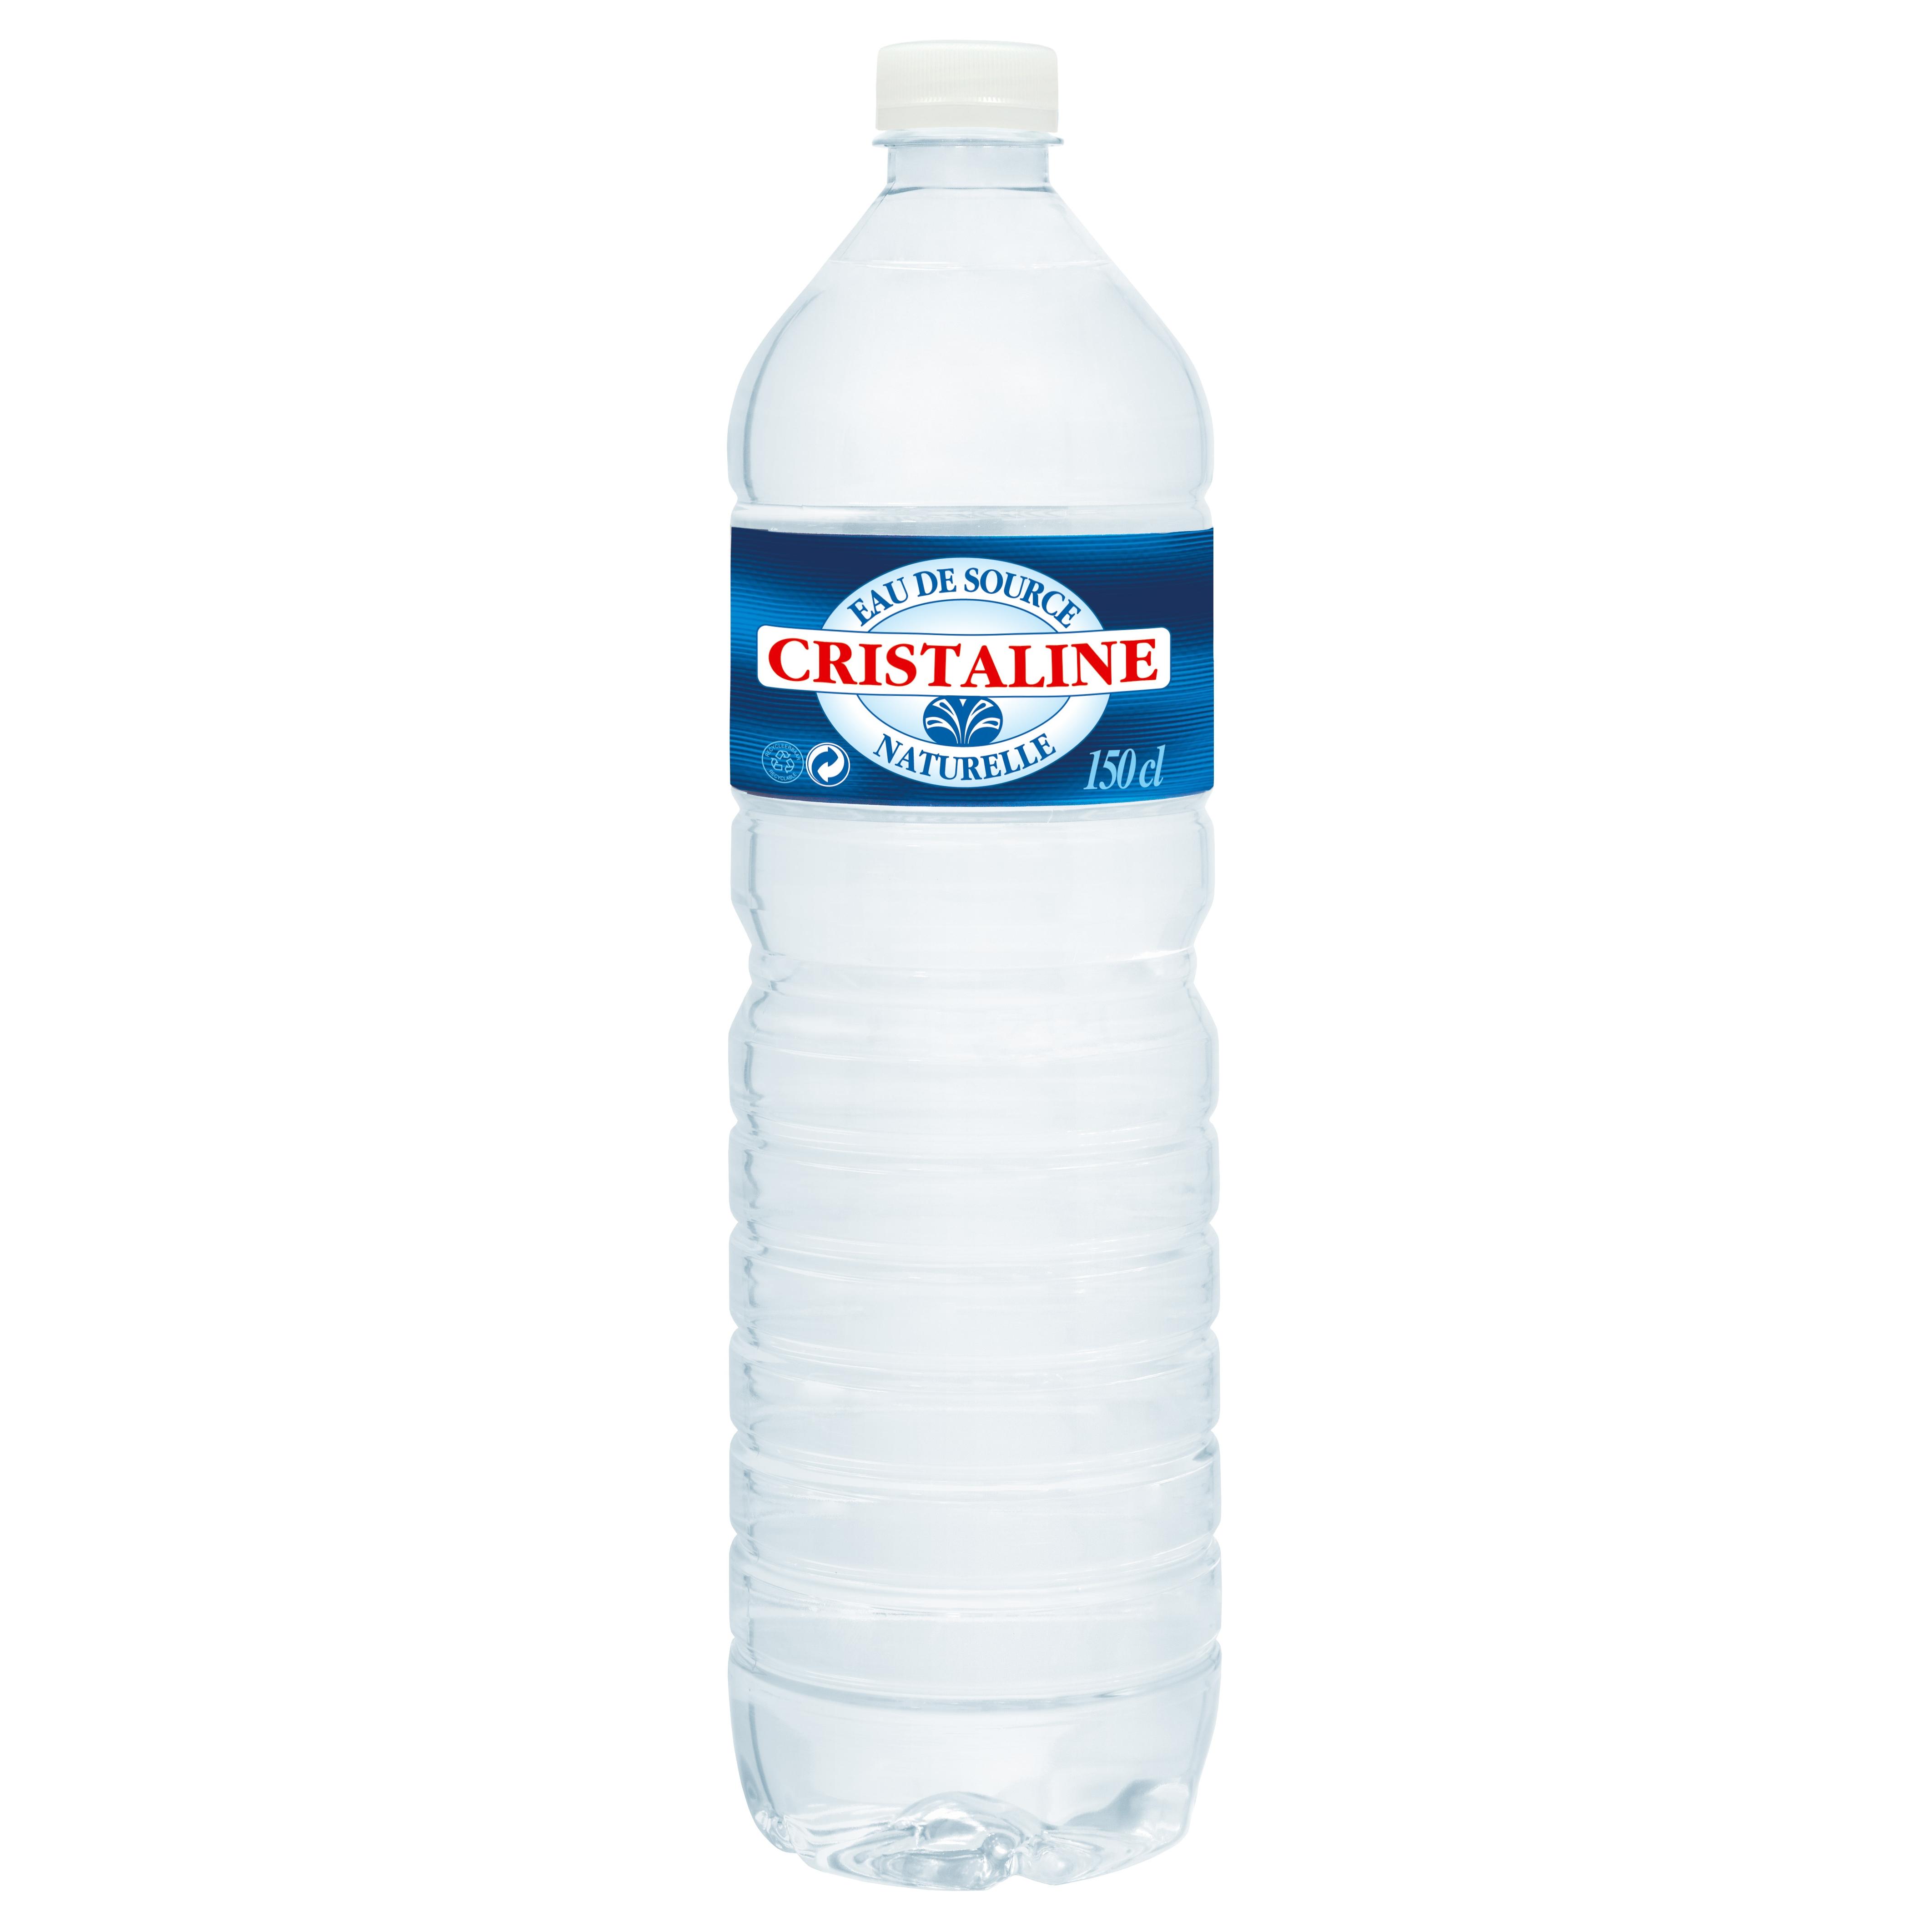 Cristaline (1.5 L)